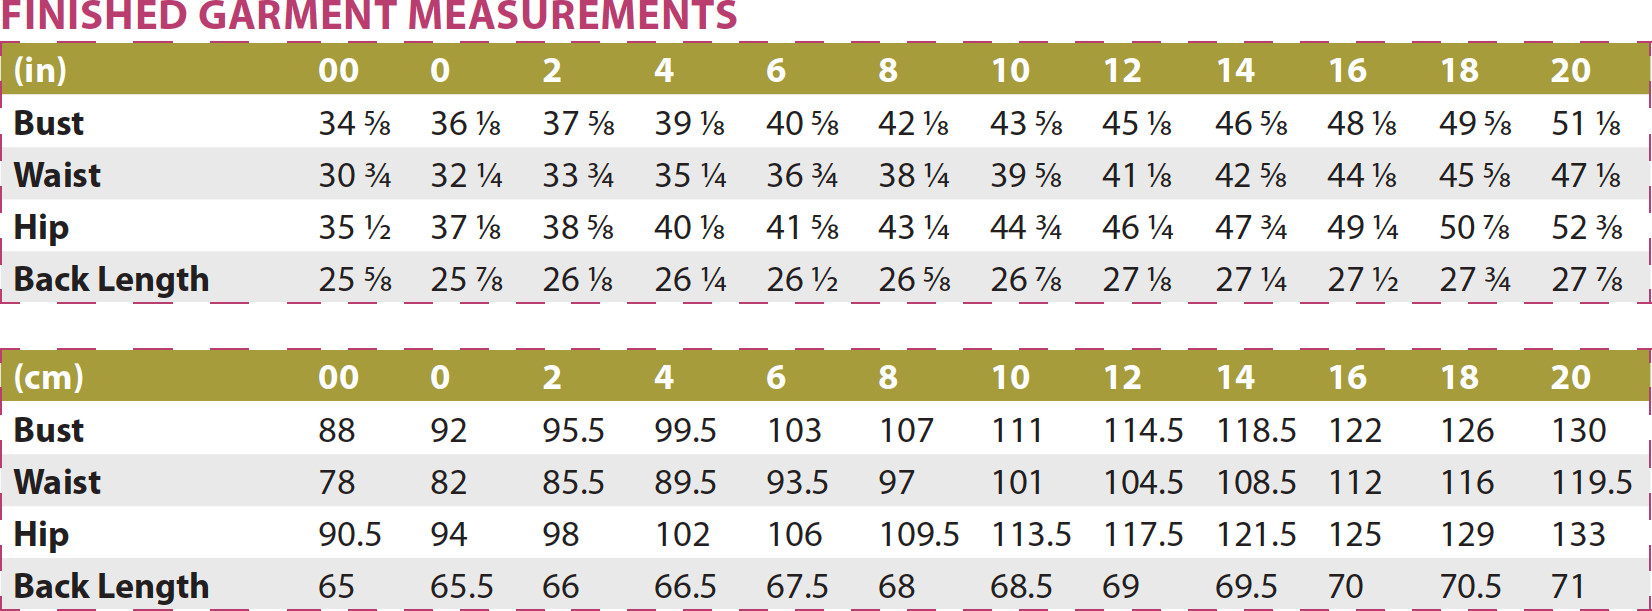 Orono Top PDF Sewing Pattern Finished Garment Measurements